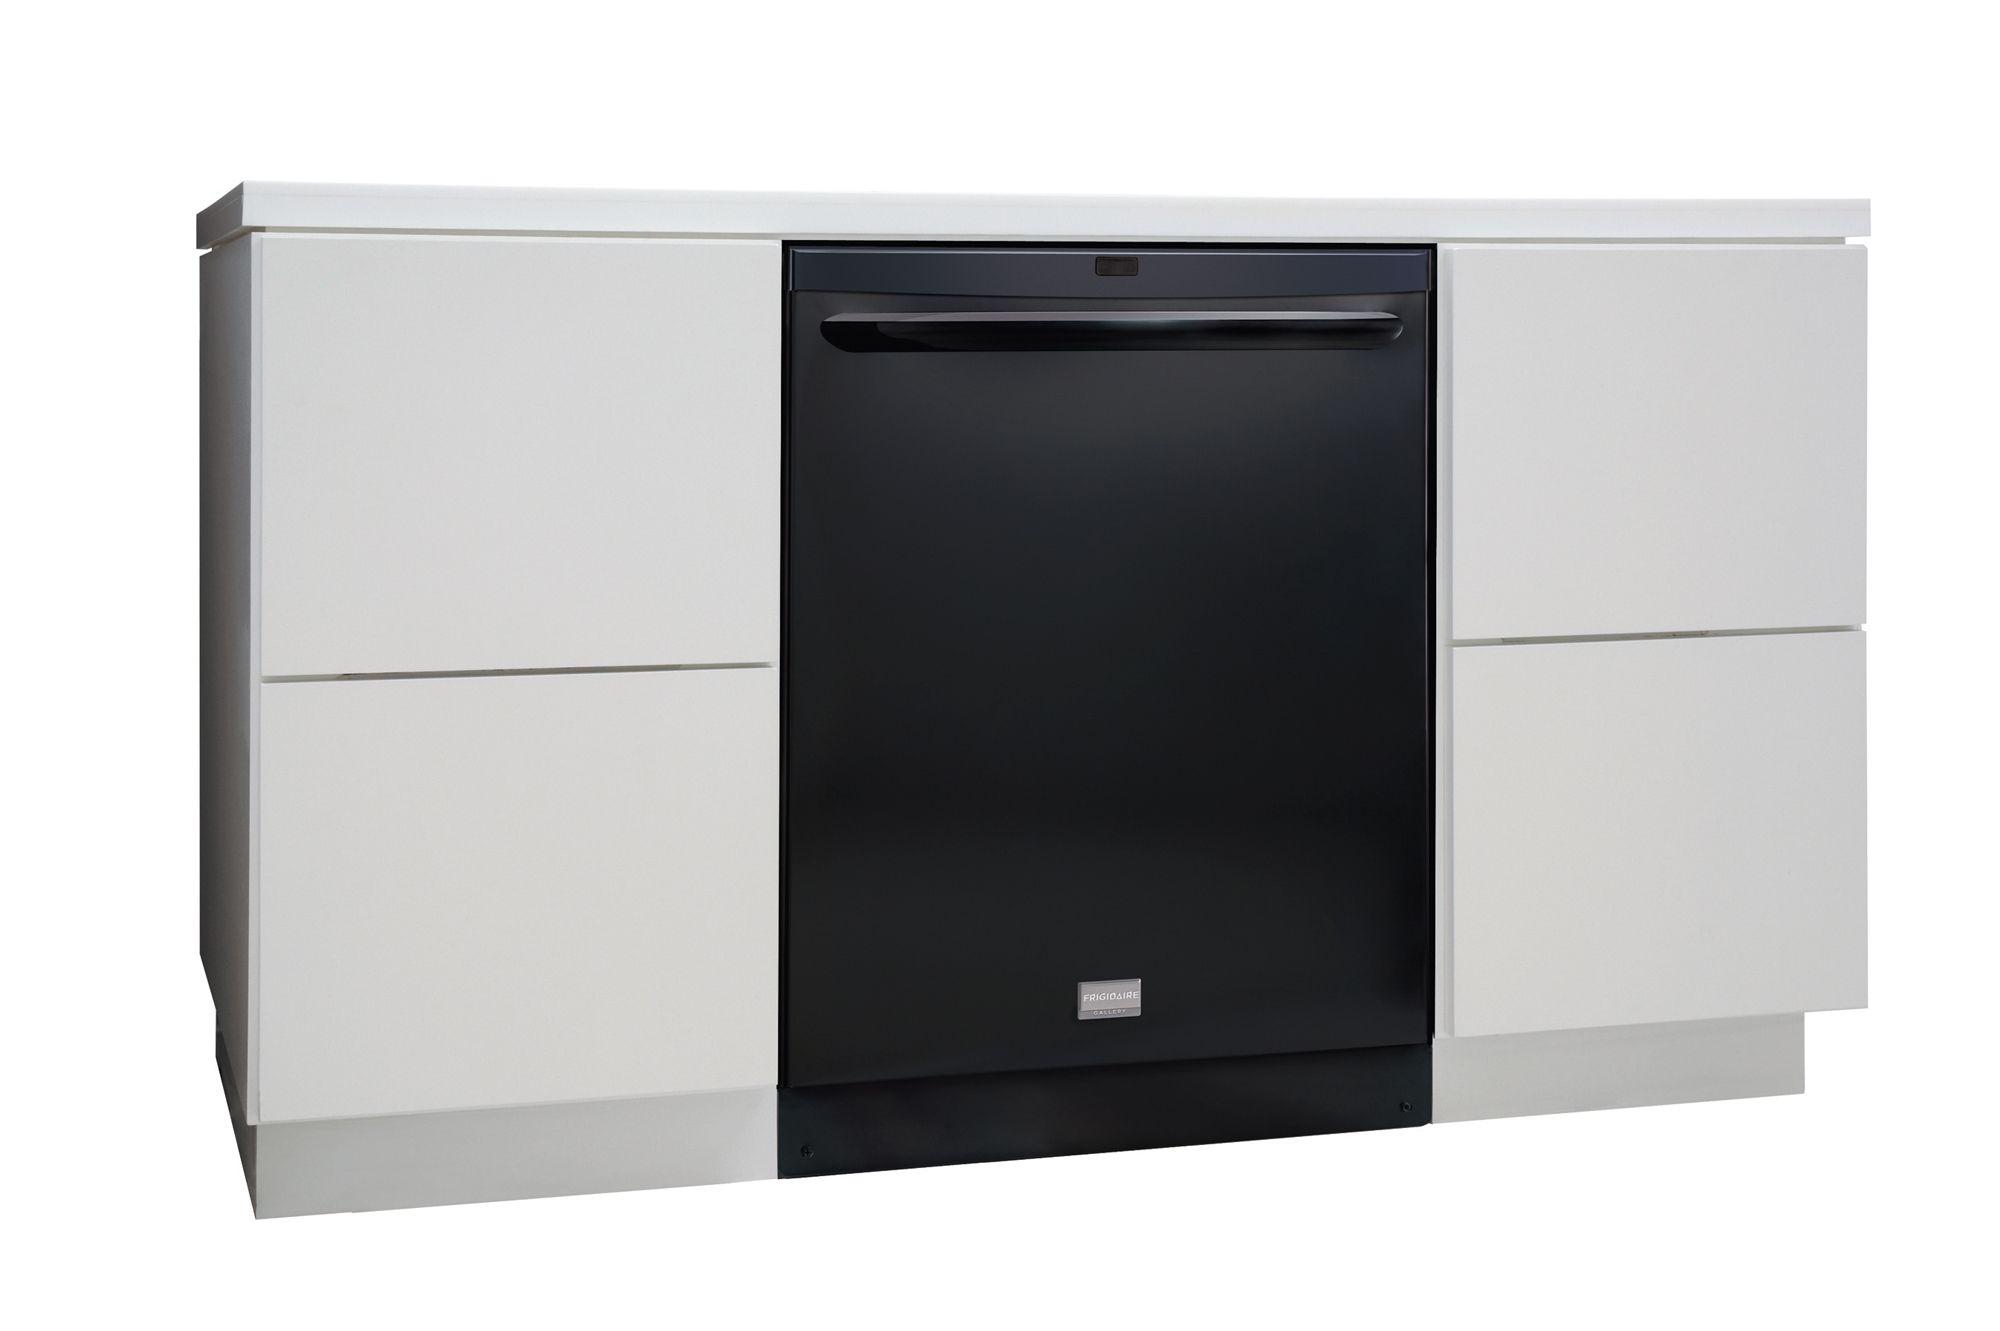 Frigidaire Gallery 24 in. Built-In Dishwasher (FGHD2433KB)